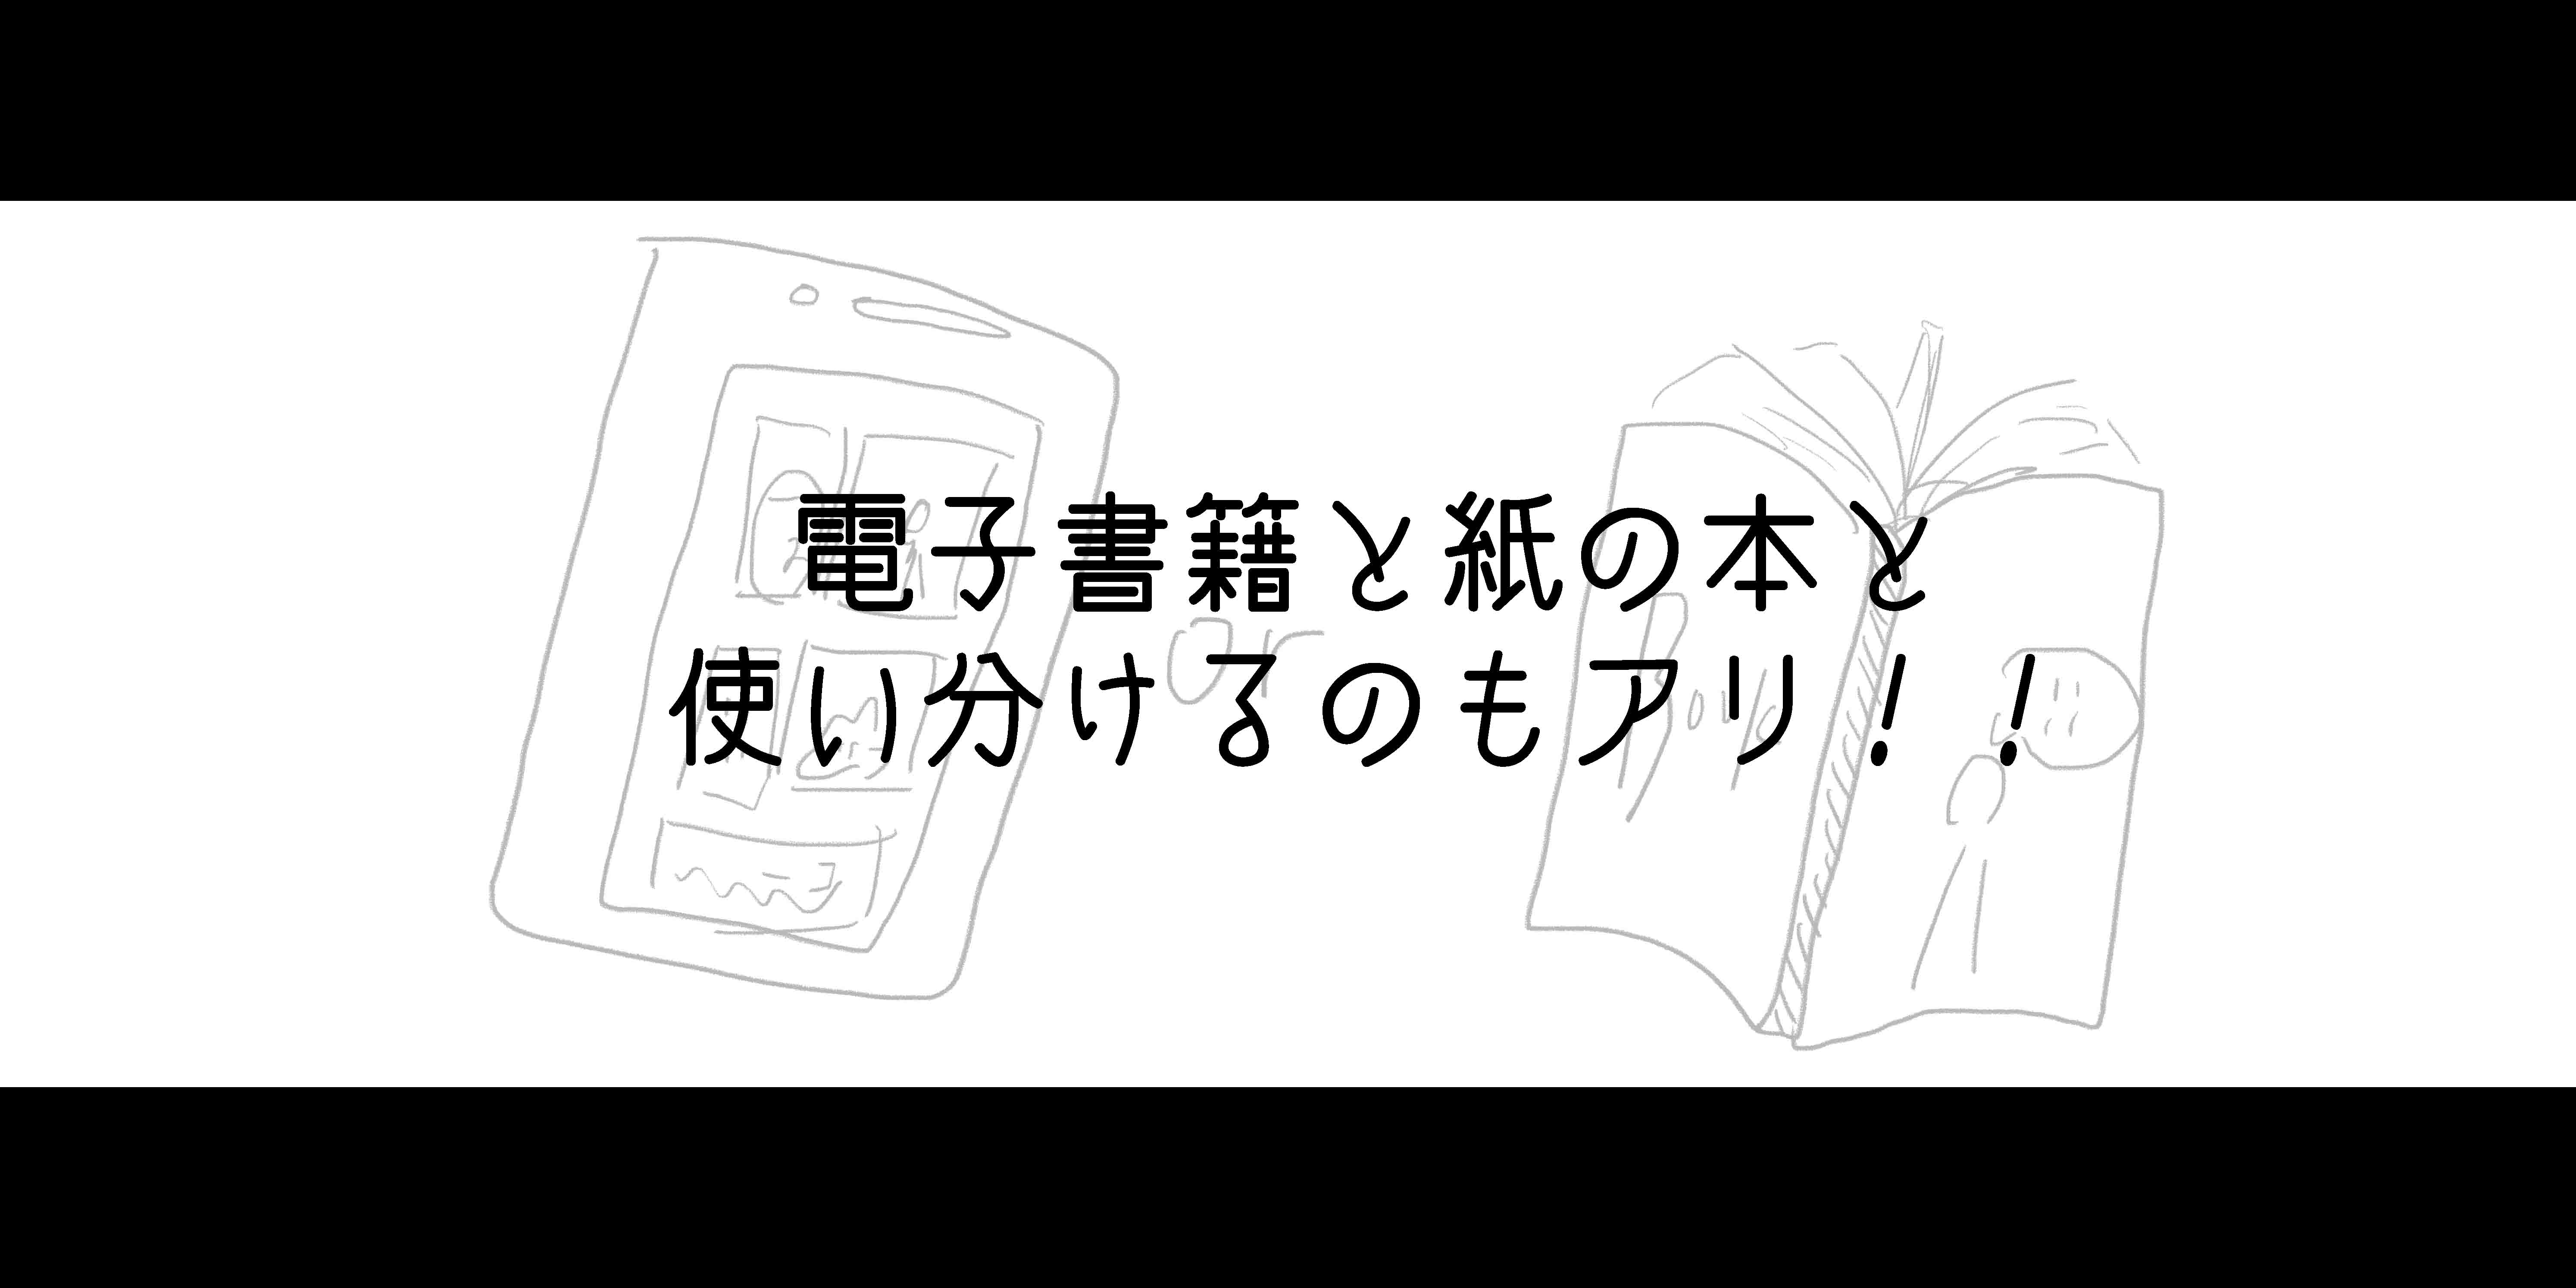 【book】電子書籍と本を二つ使いこなすのもアリ!!